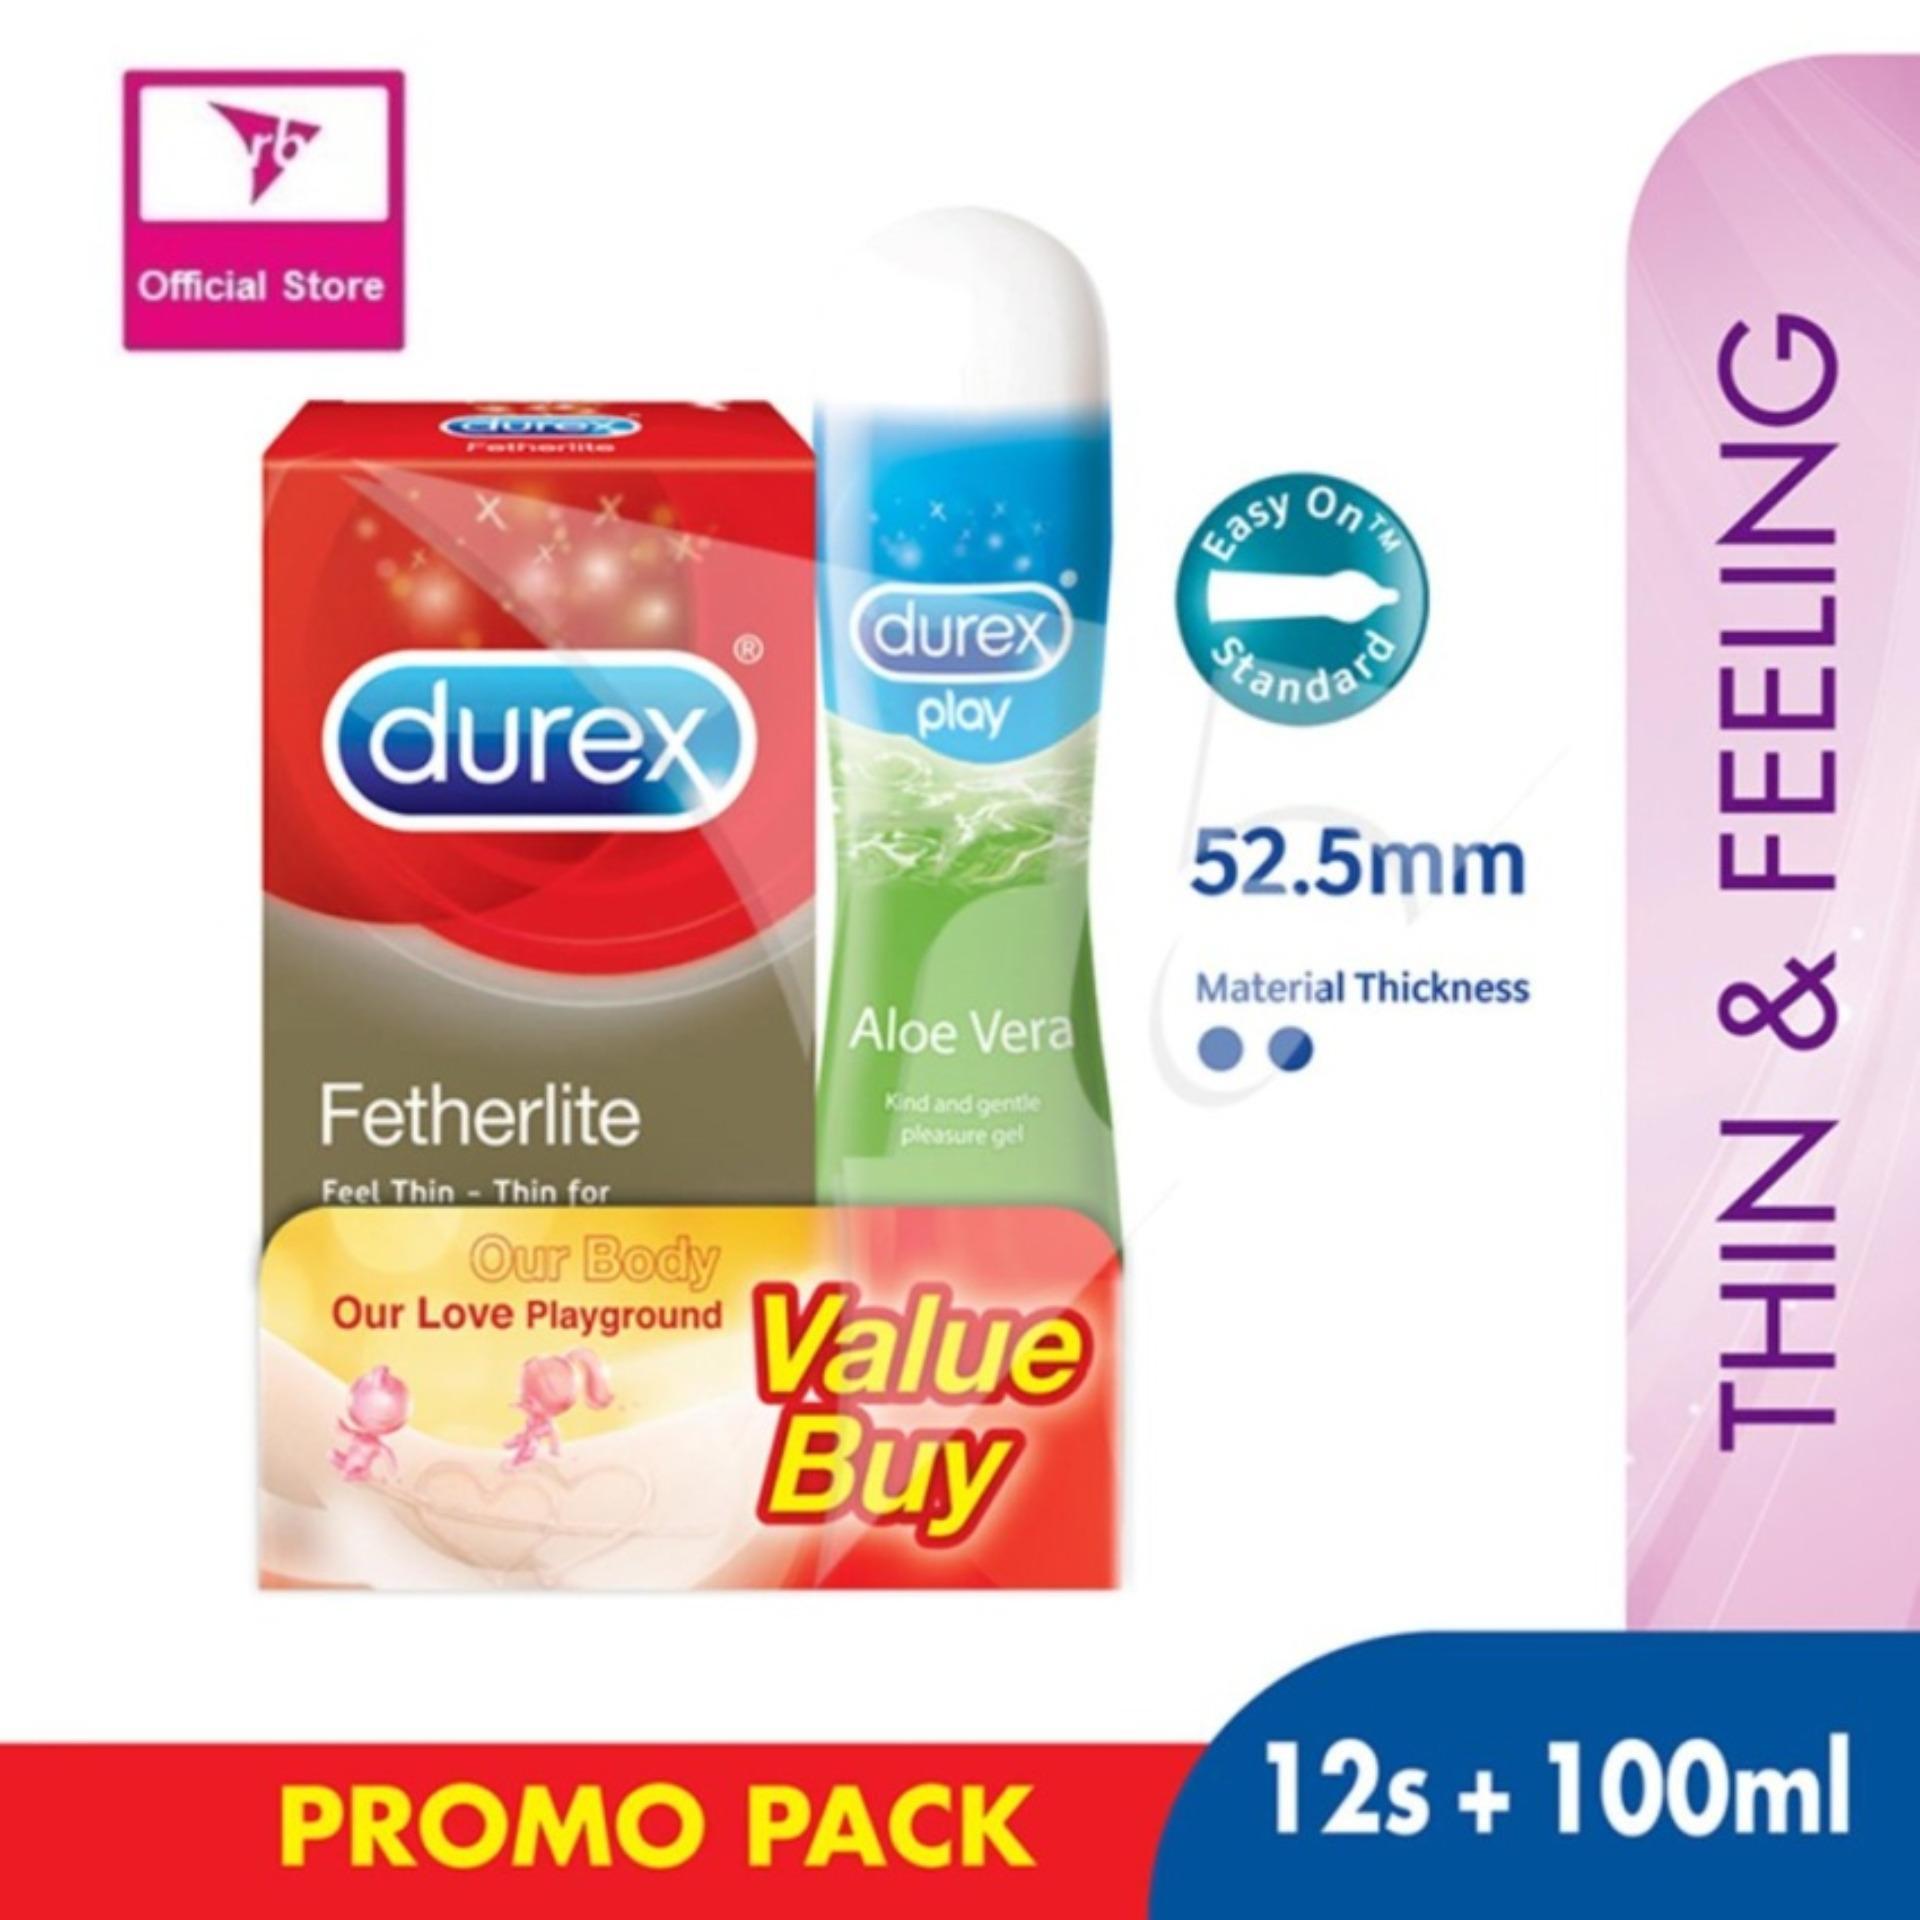 Discount Durex Fetherlite Condoms 12S Durex Play Aloe Vera Intimate Lube 100Ml Value Pack Durex On Singapore